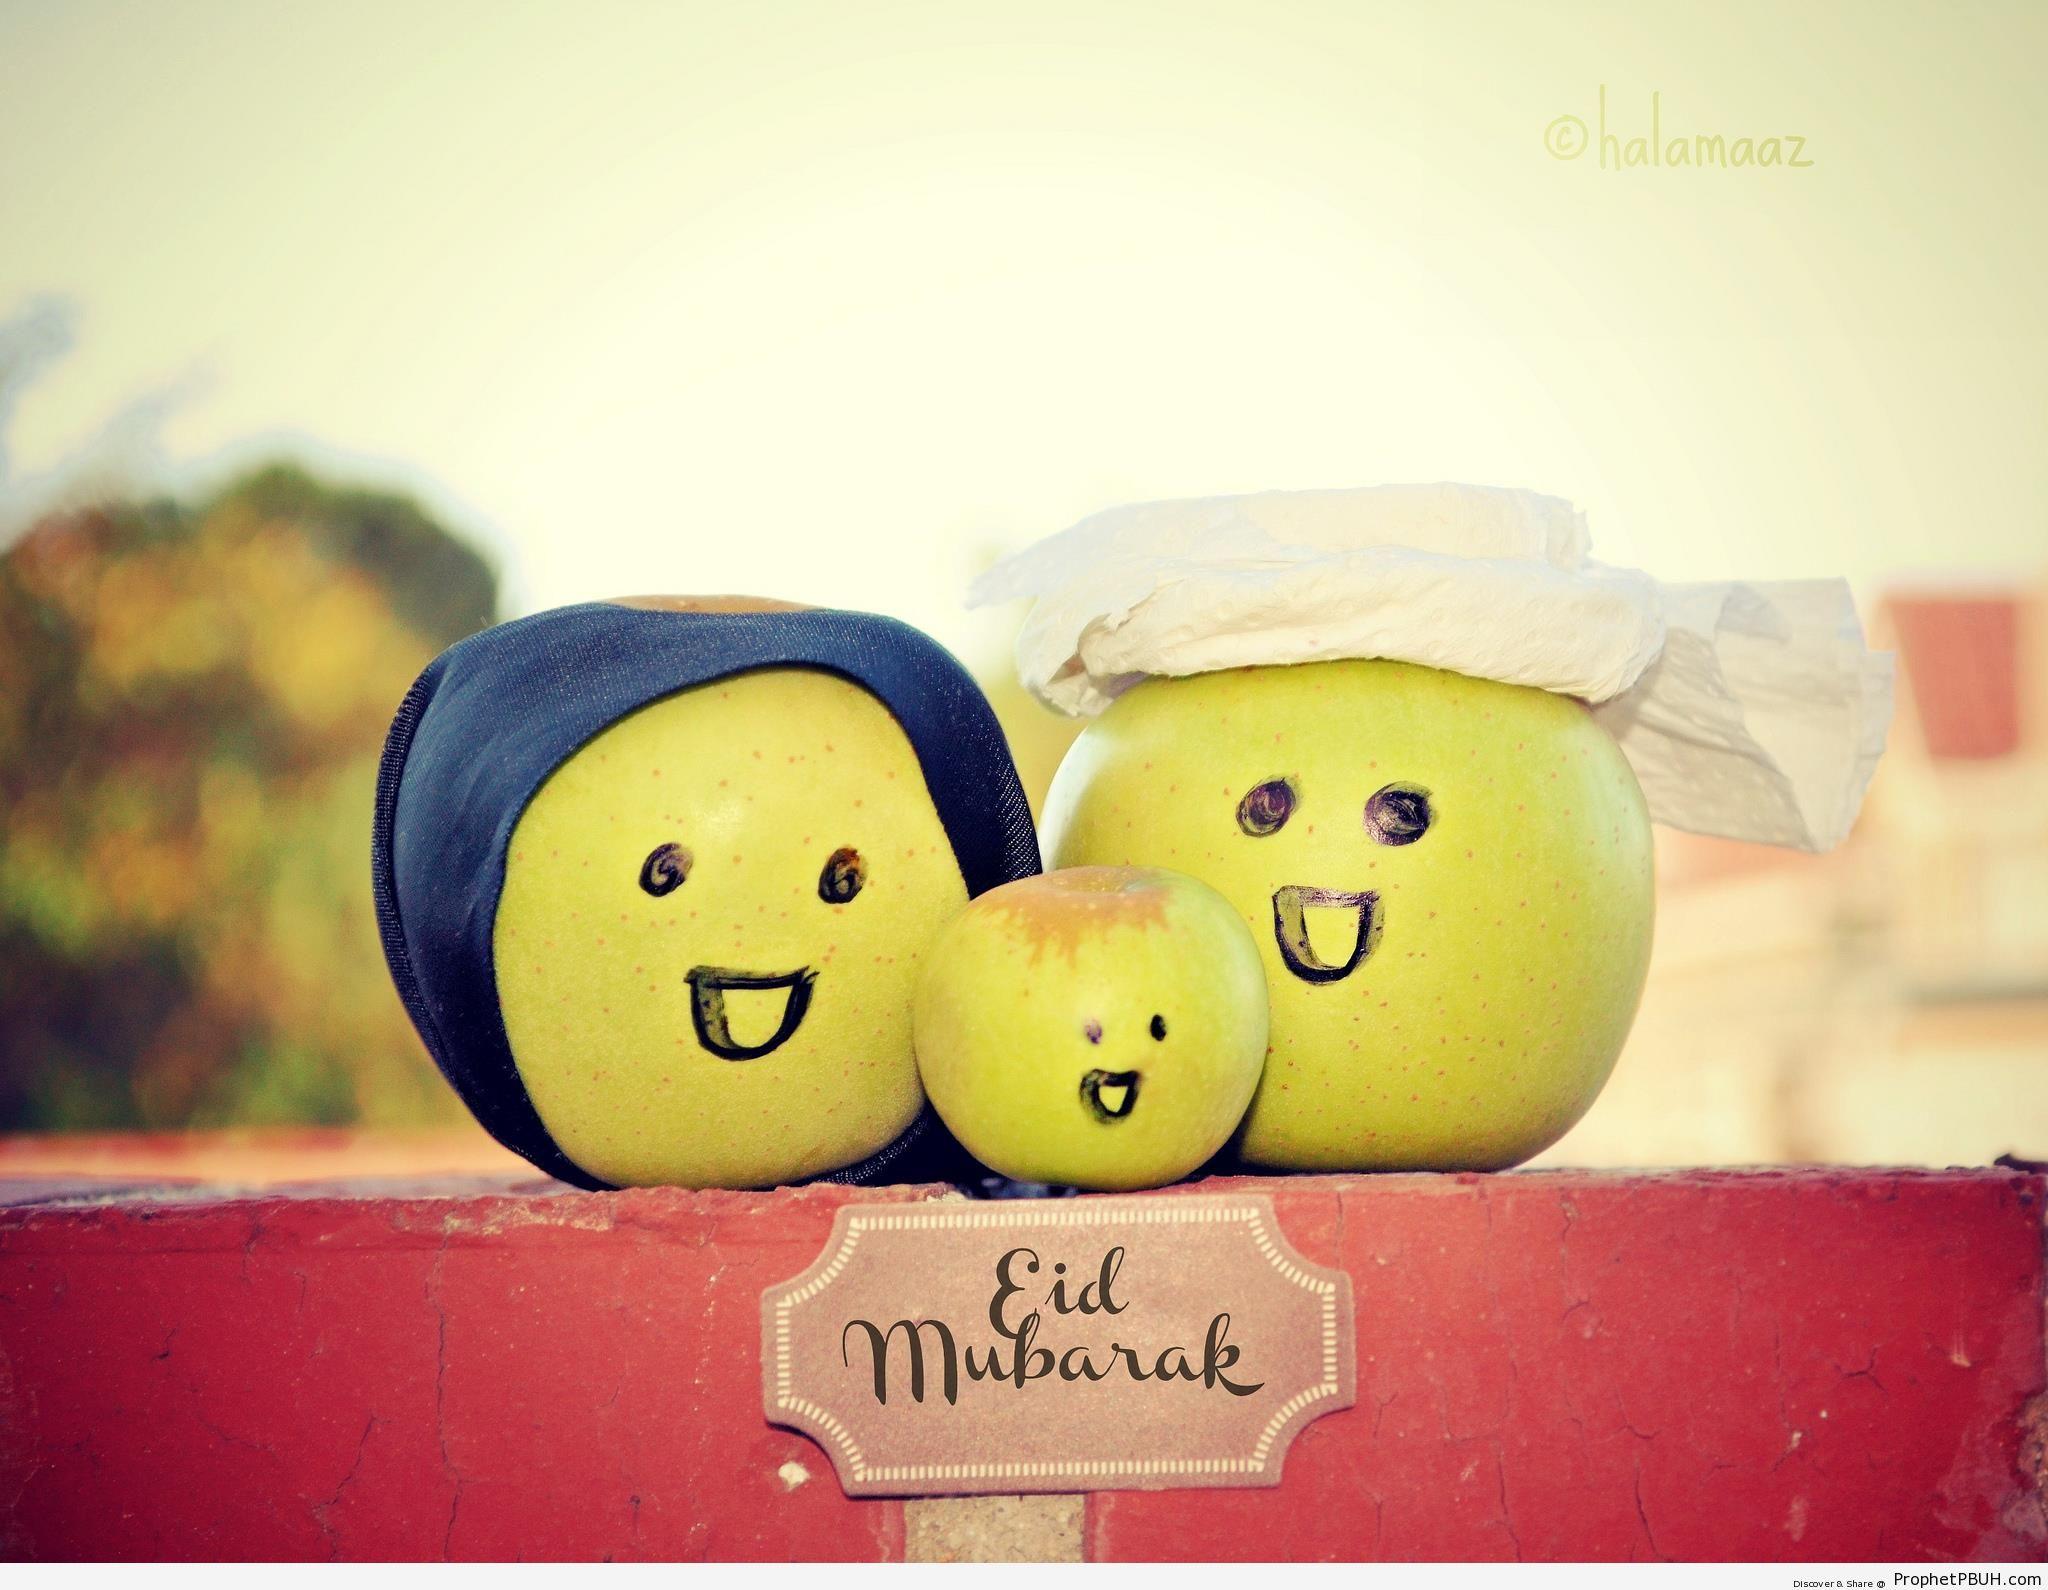 Wallpaper Cute Cartoon Muslimah Eid Mubarak Greeting Written Under Smiling Muslim Apple